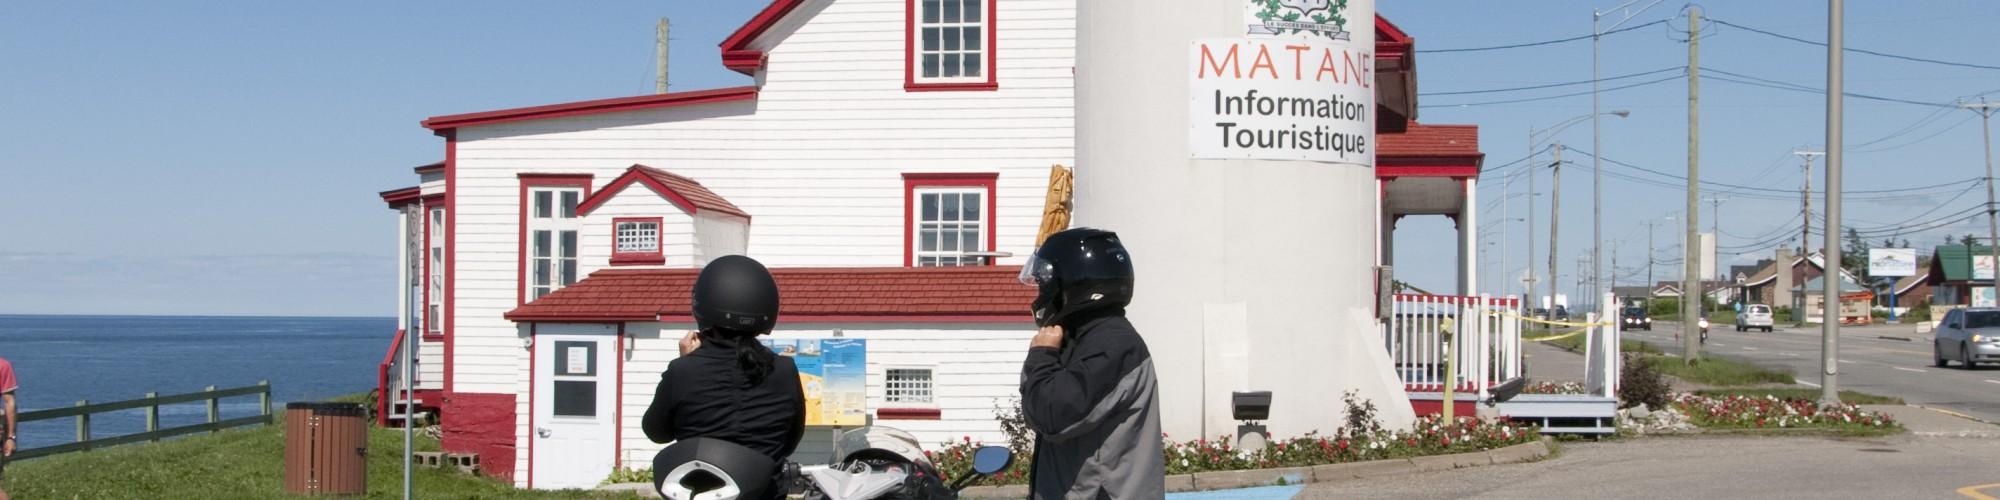 Lighthouse, Matane, tourist information